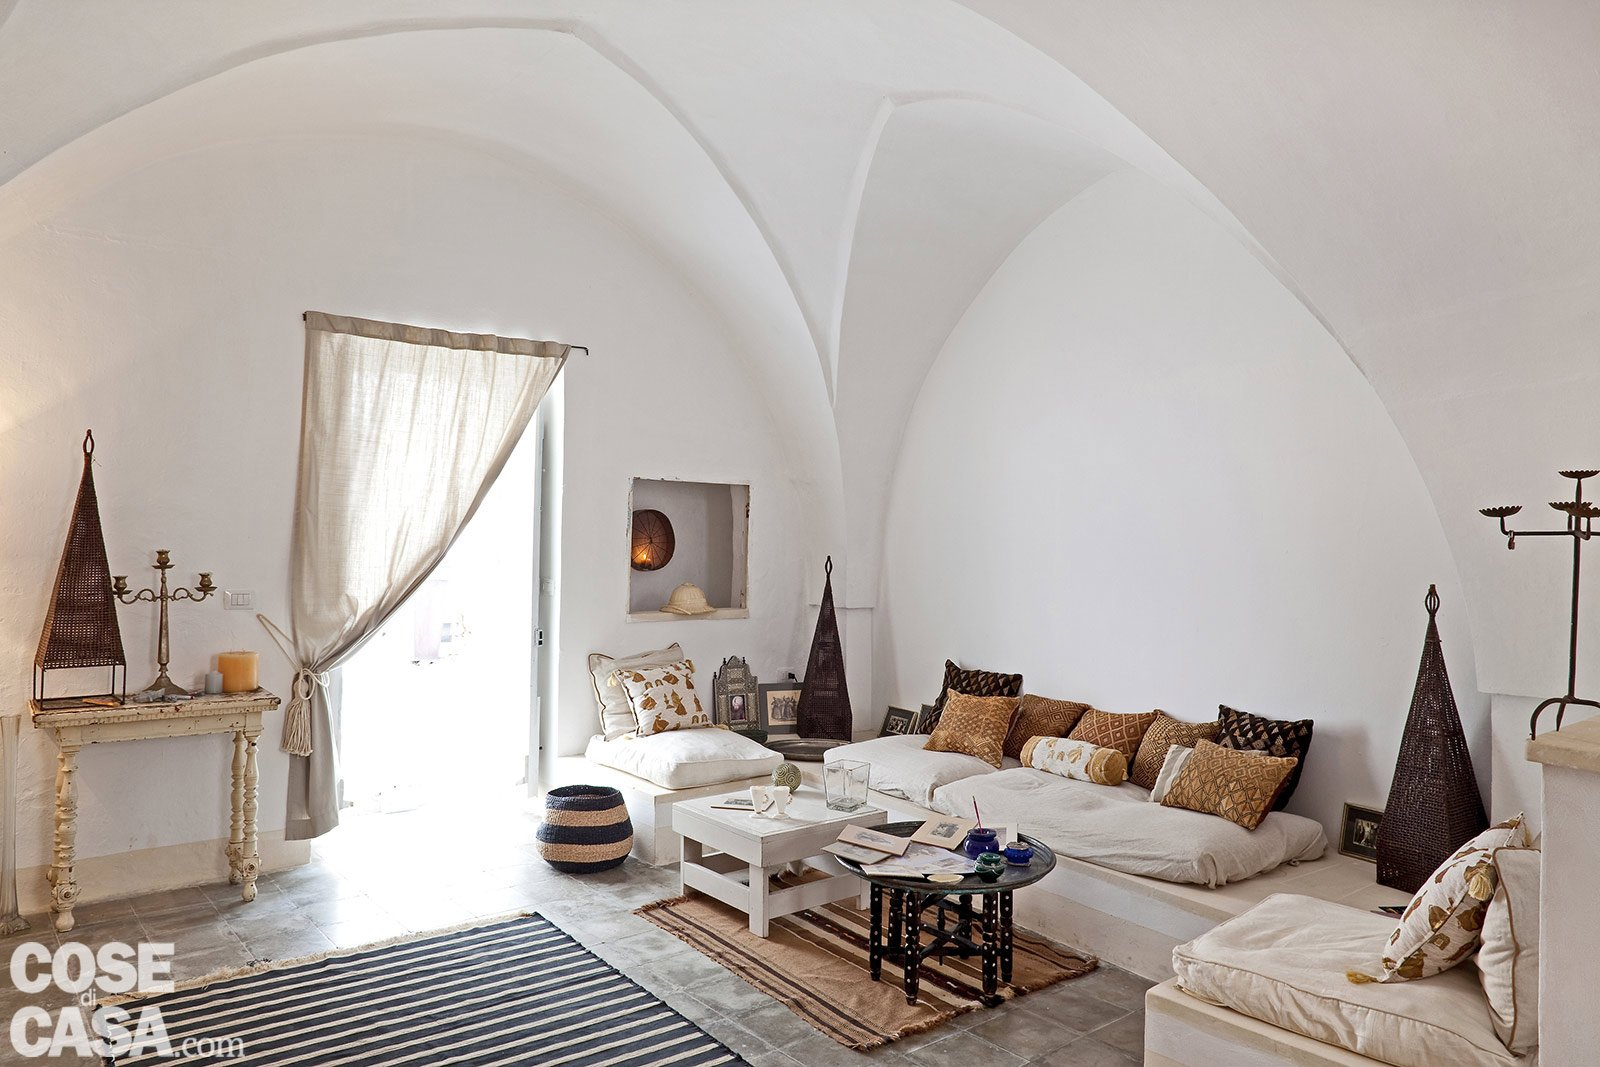 Una casa in pietra in stile mediterraneo cose di casa for Pitturazioni moderne